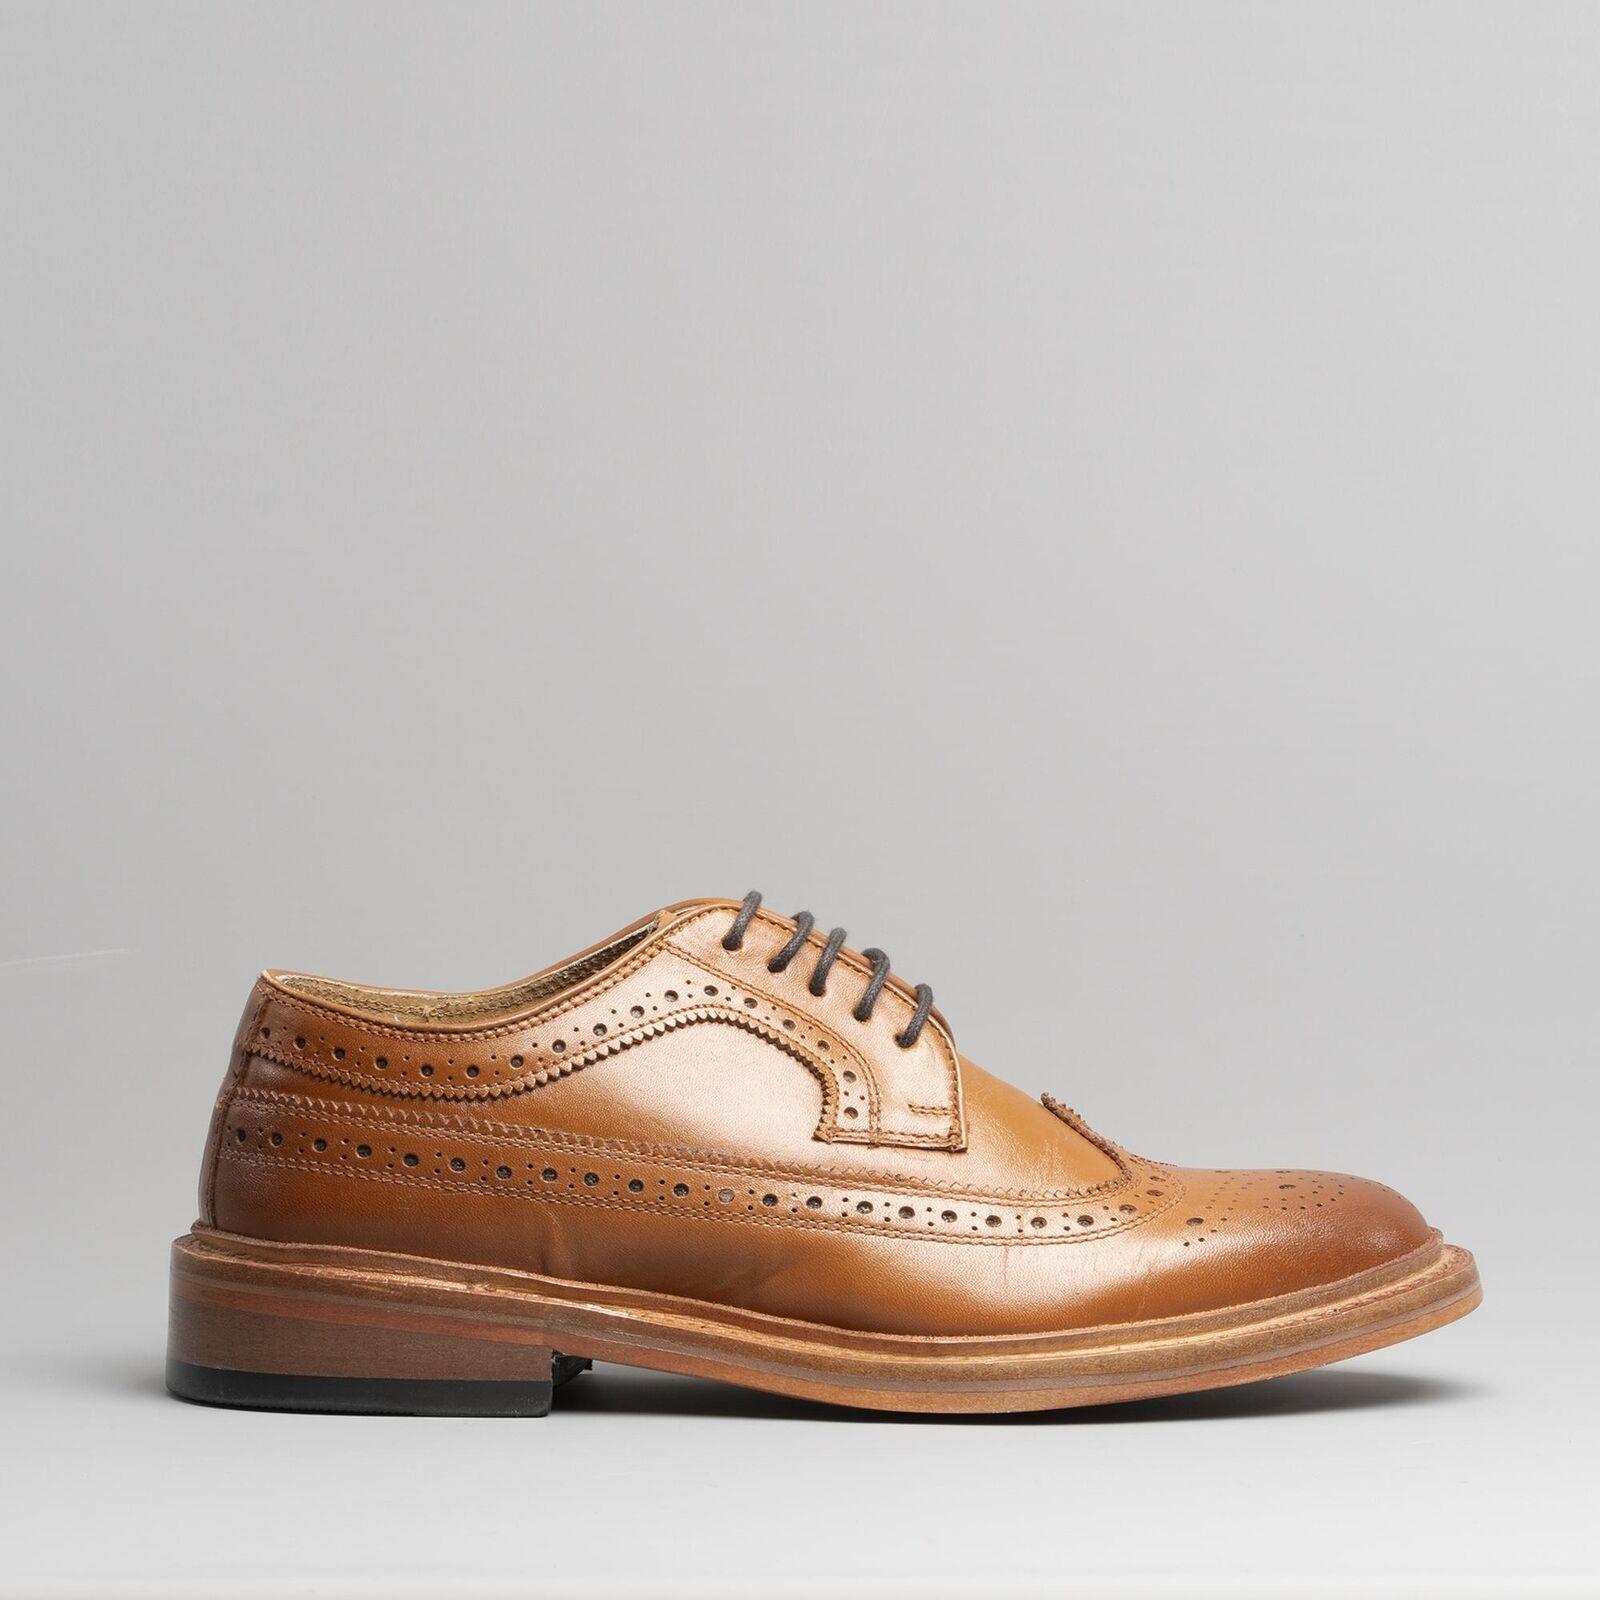 Kensington Luis linea uomo lusso in Pelle Formali CALATA Tradizionale Scarpe Derby Tan